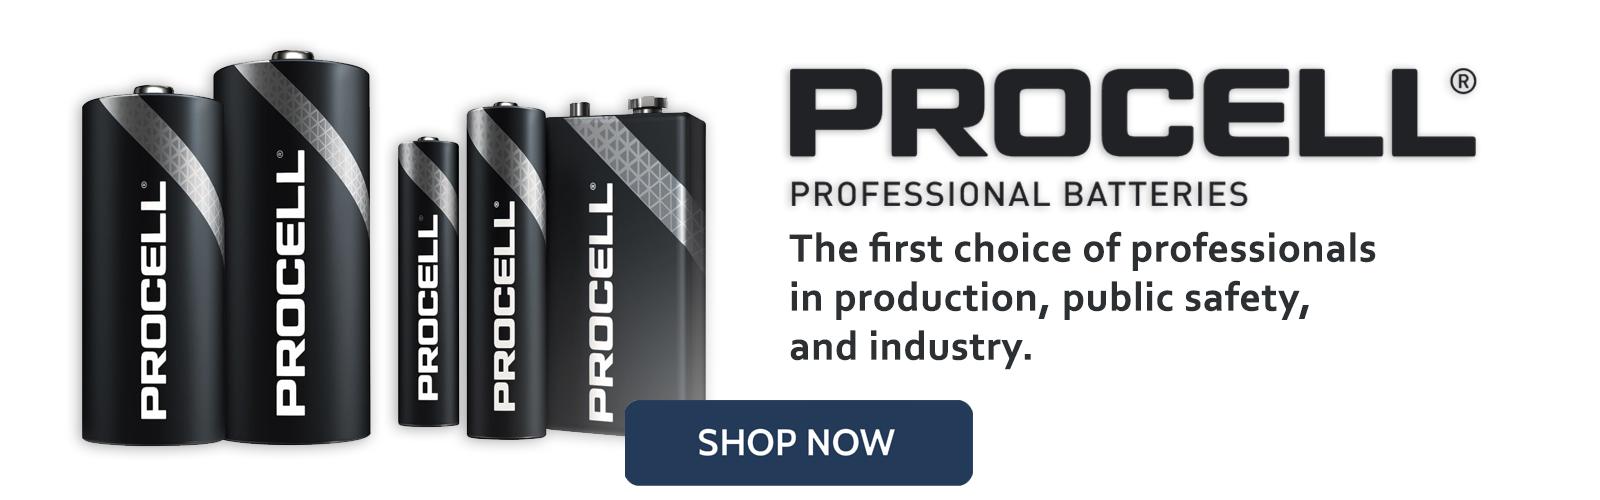 Shop Procell